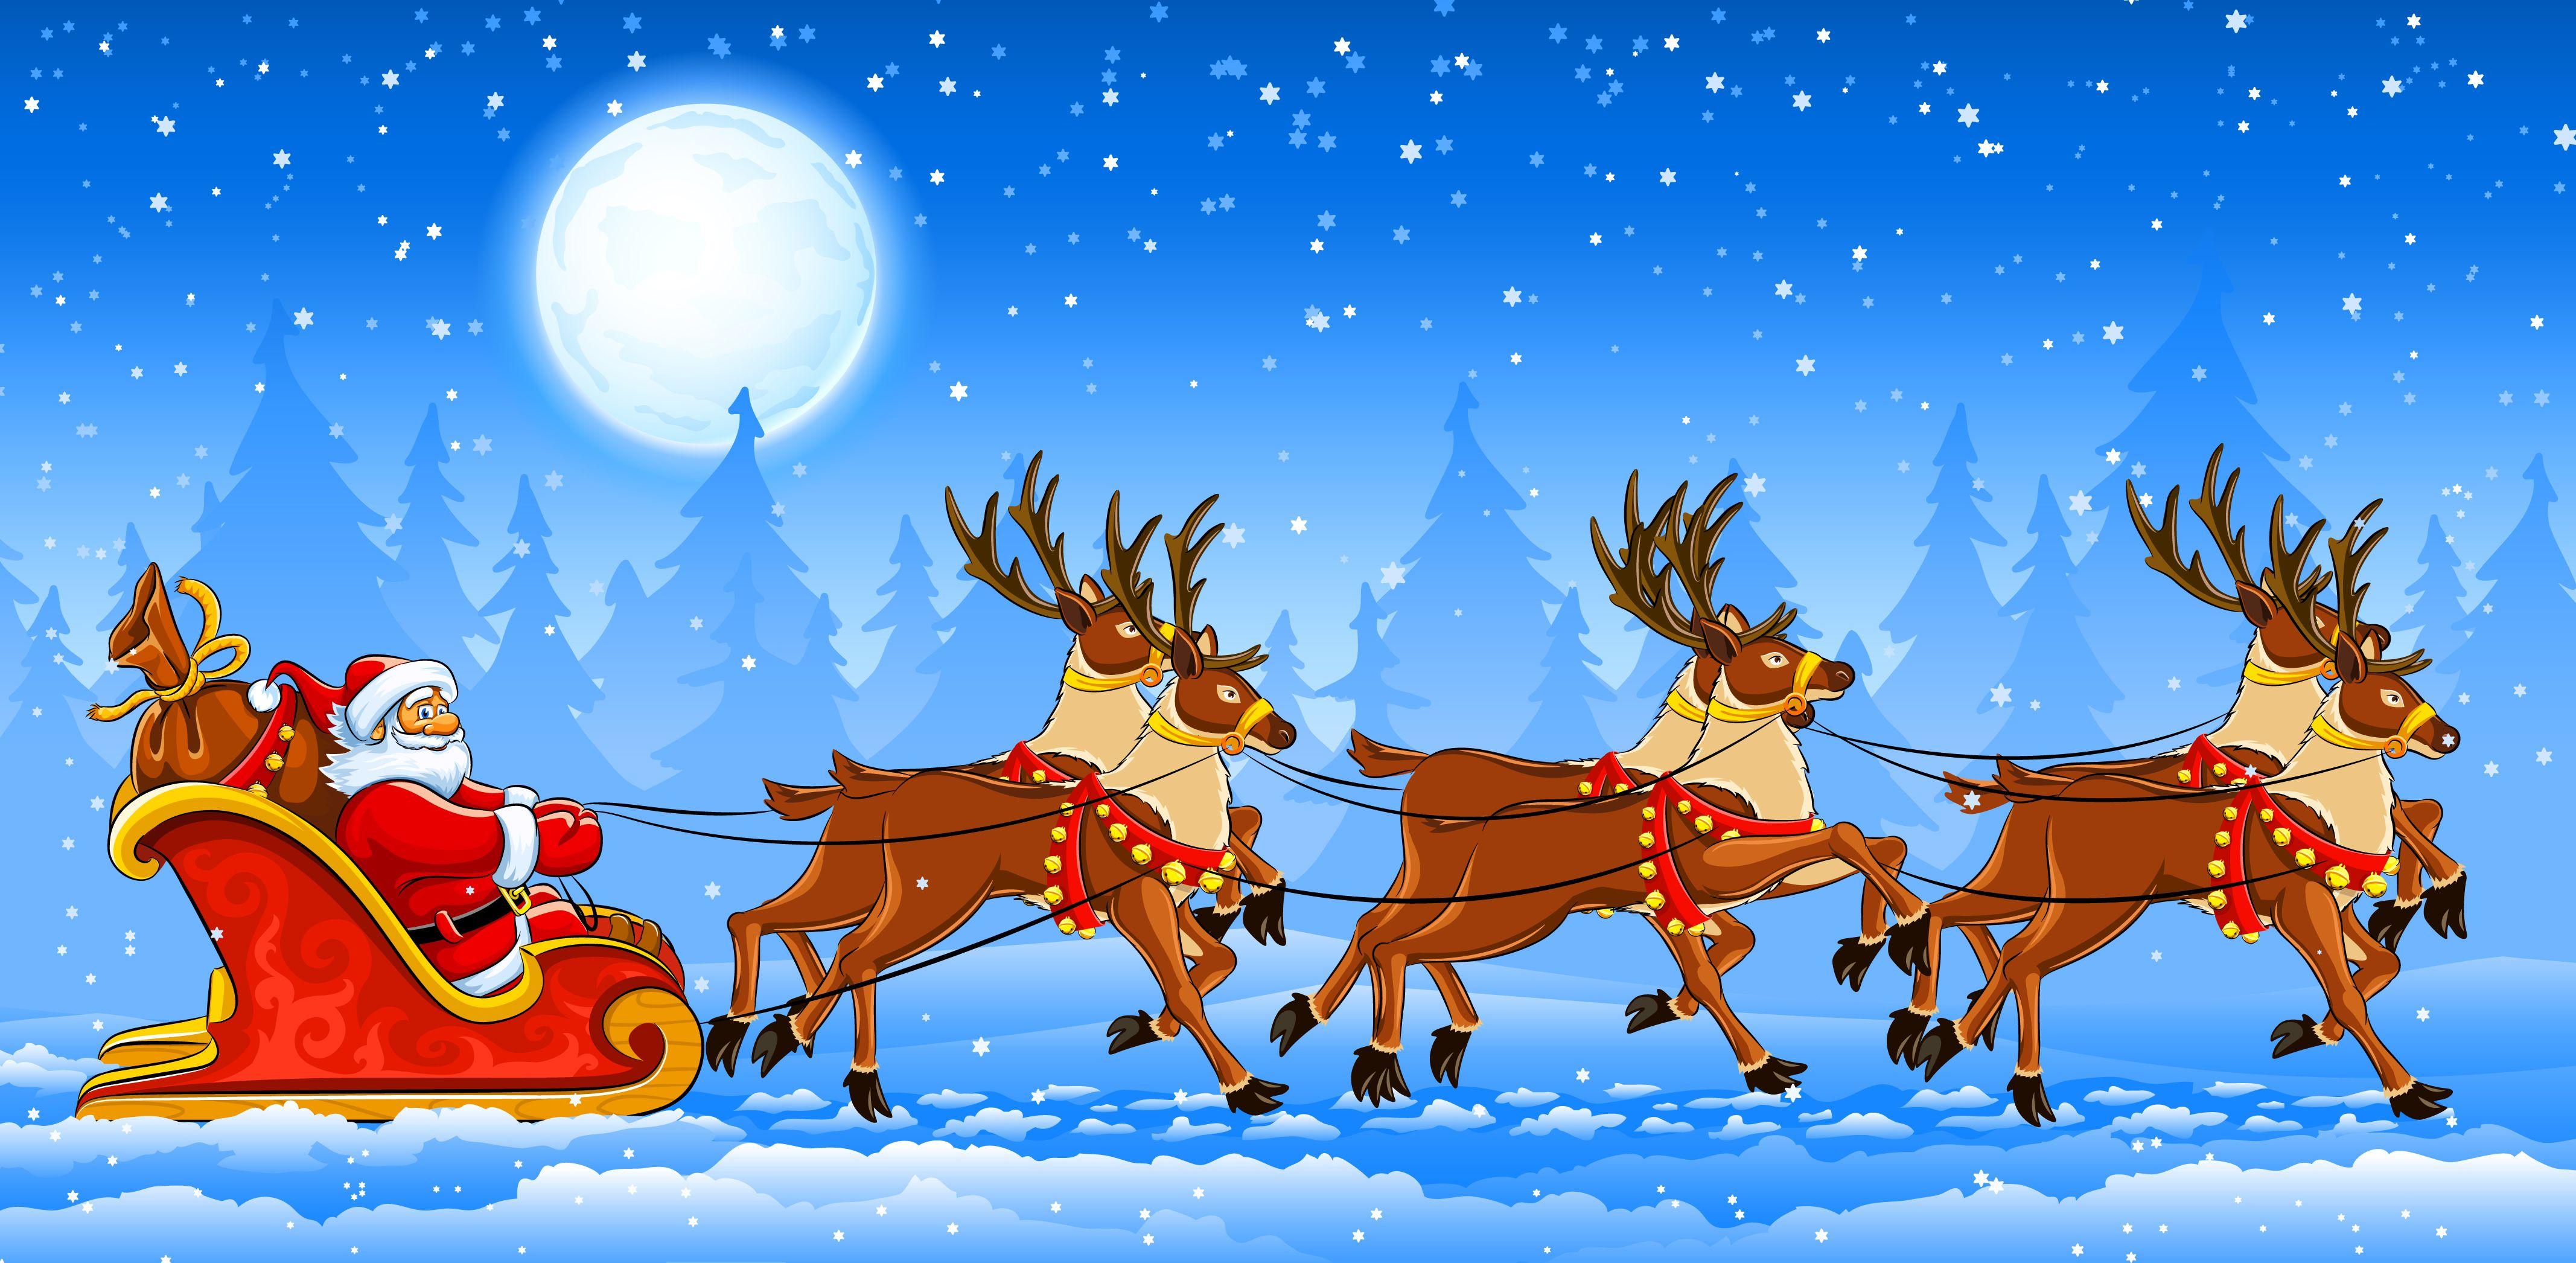 Free Vector Santa Claus And Elk Vector 001491 Christmas Santa Claus Free Art Prints Santa Claus Vector Art Images